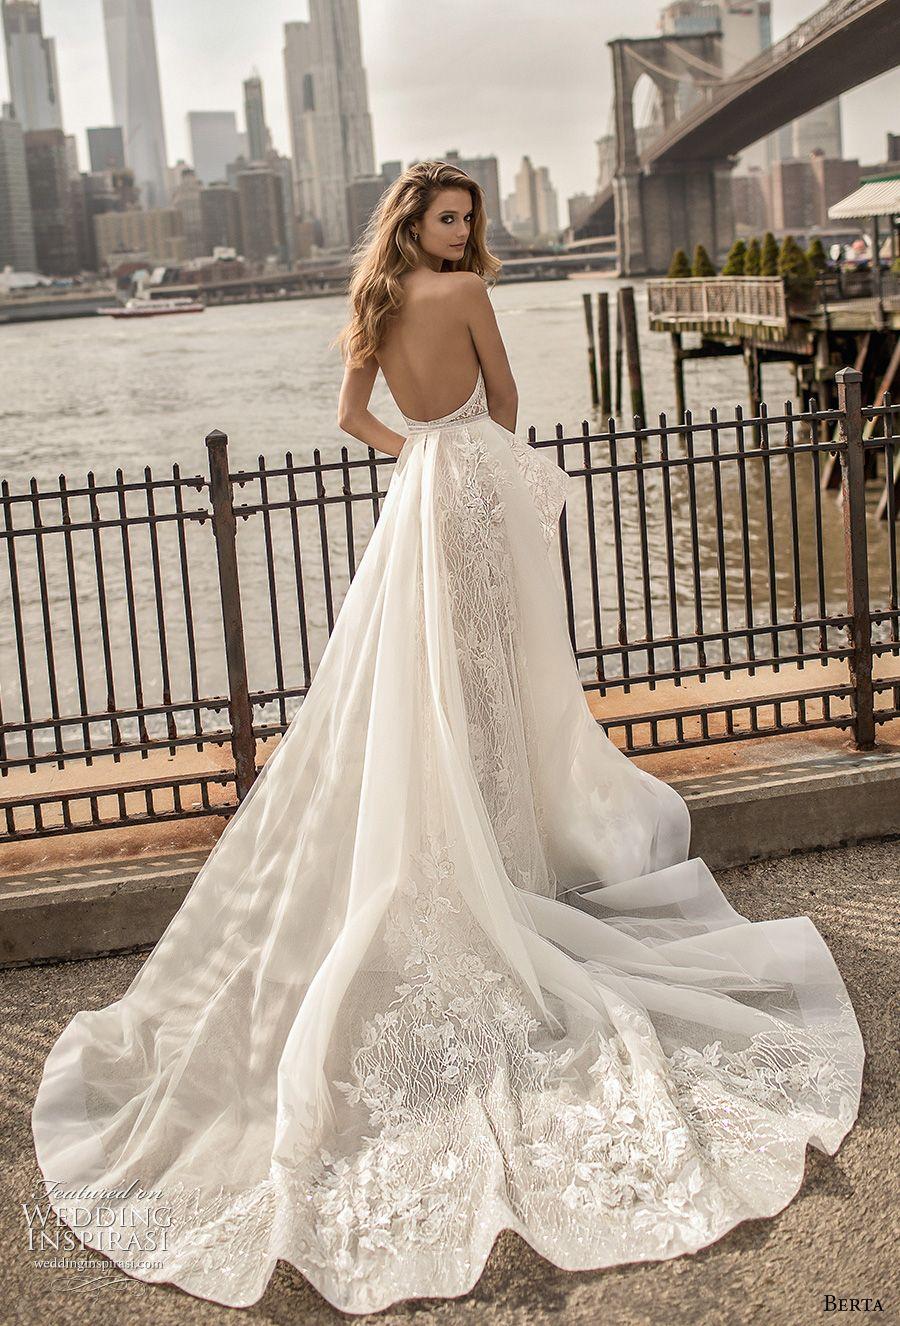 Berta Spring 2018 Wedding Dresses — Campaign Photos | Spitzen ...